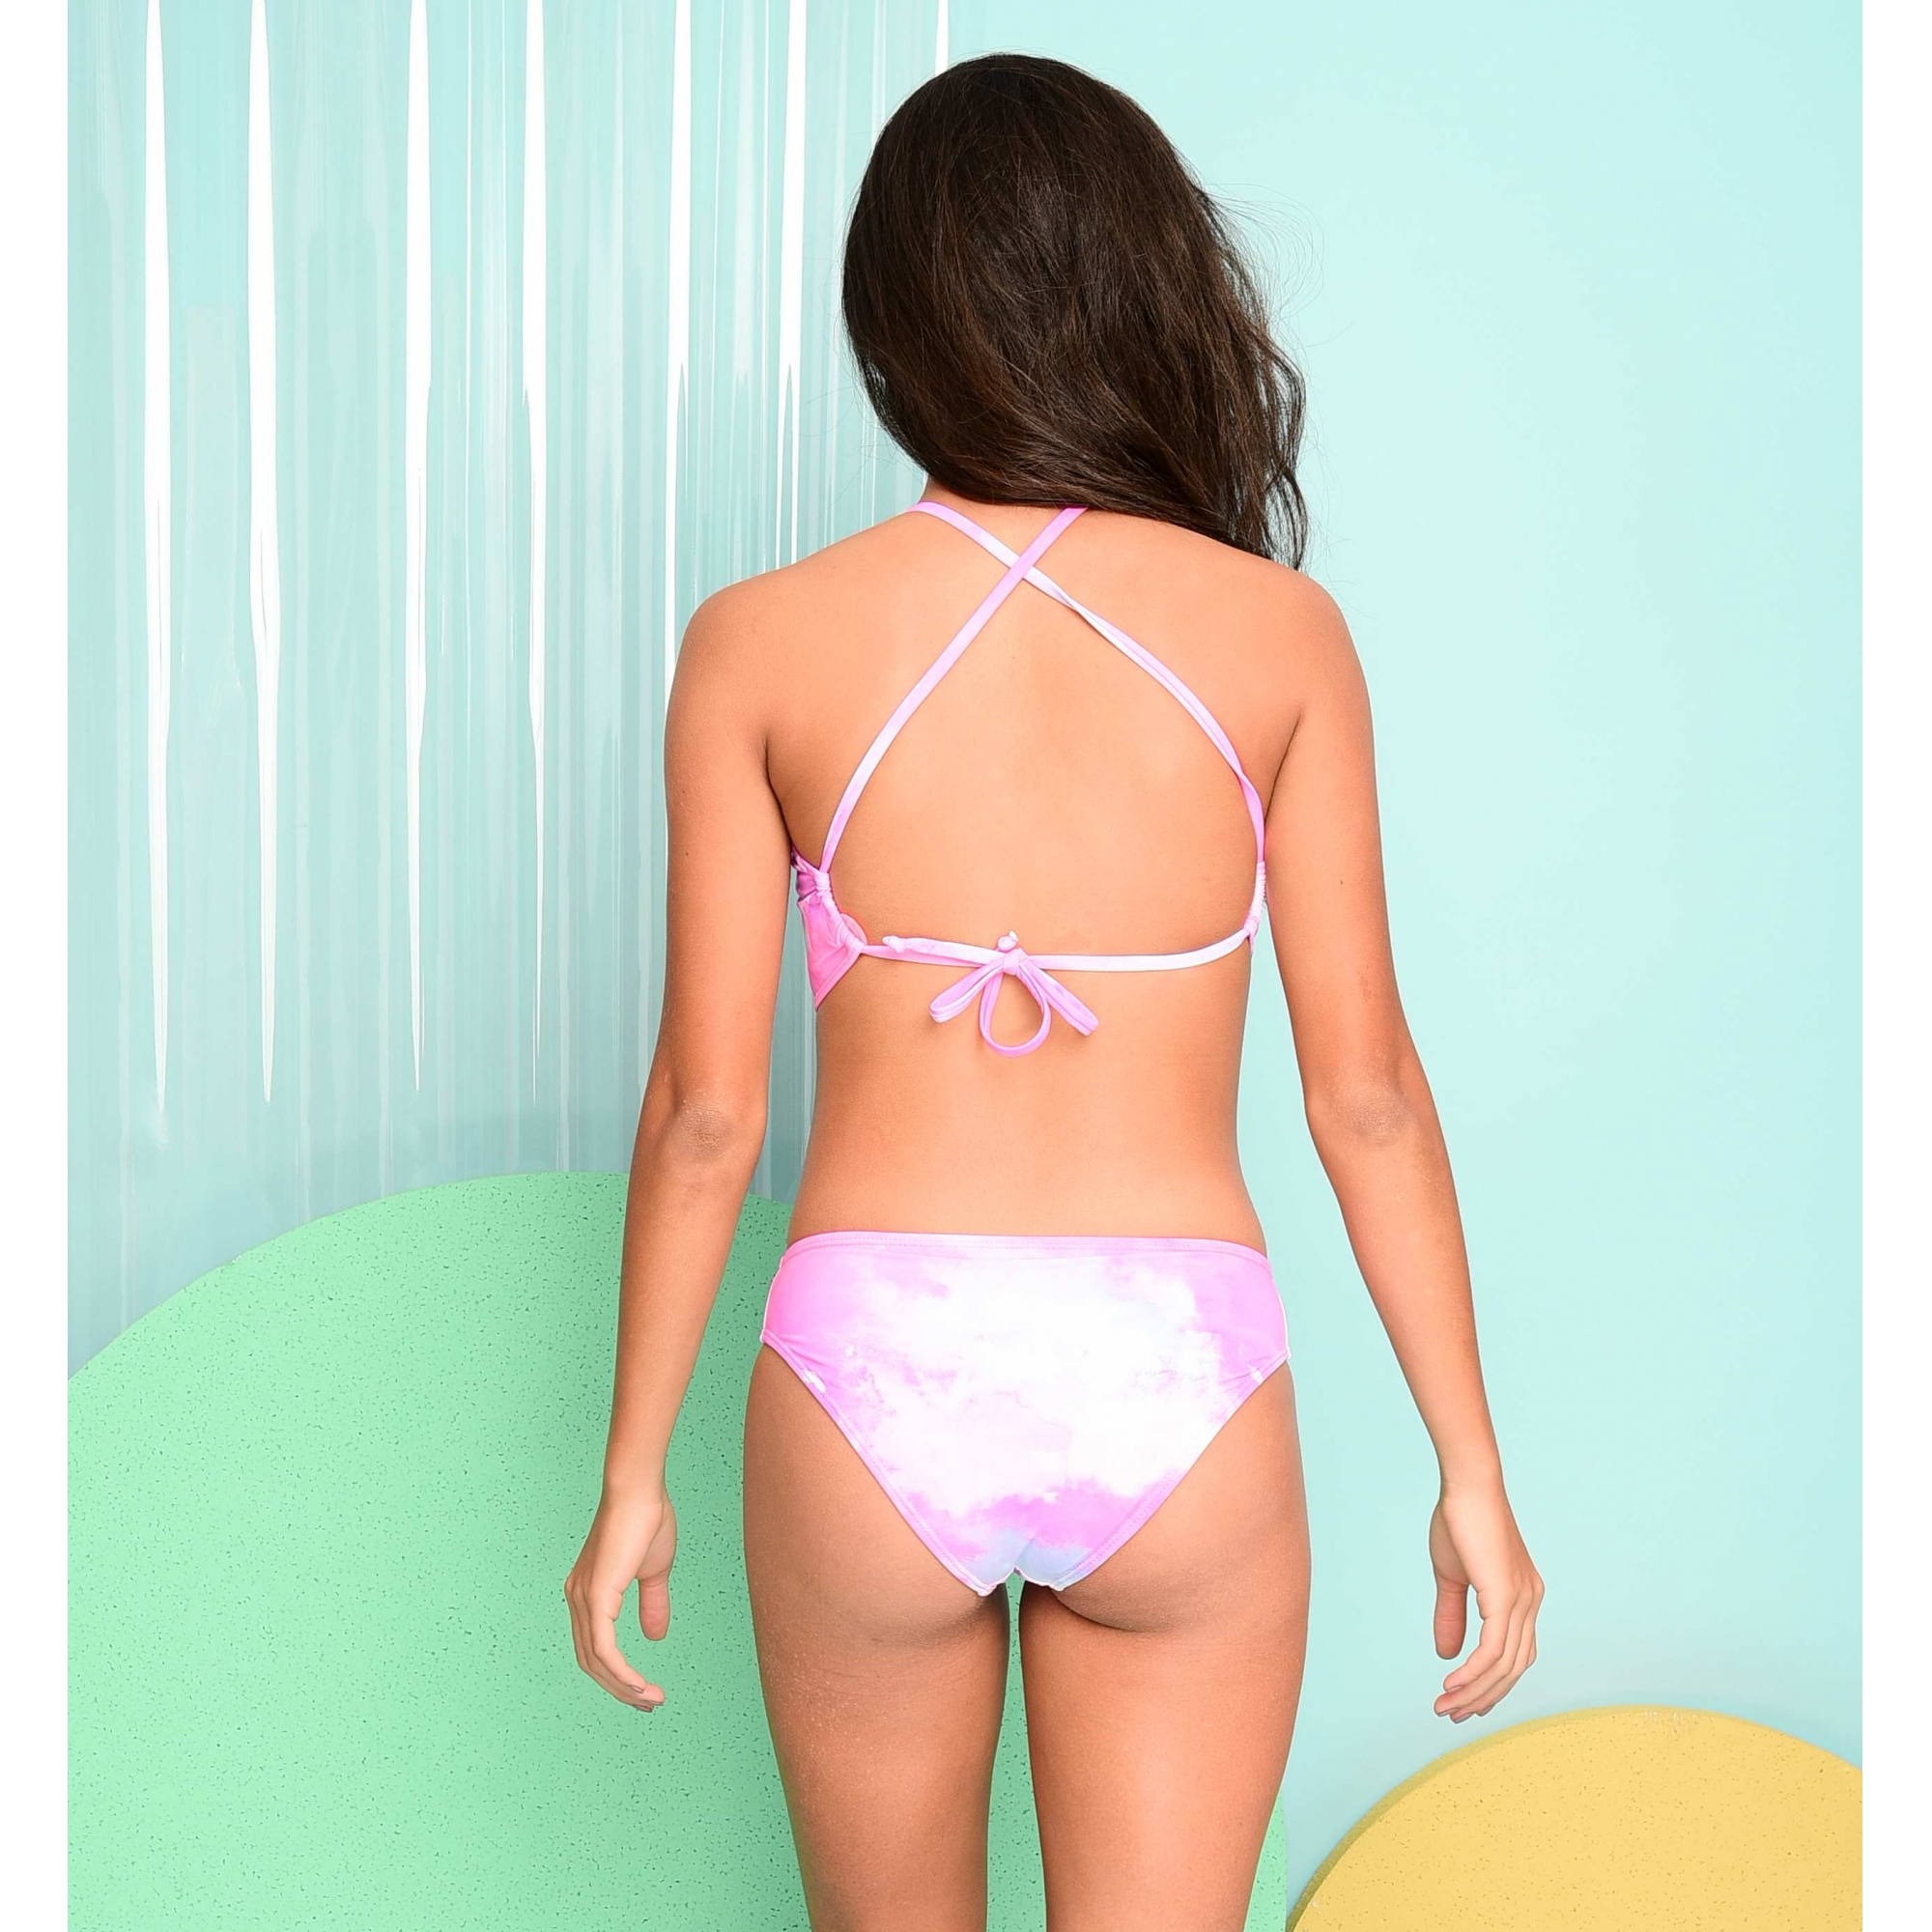 Biquíni Lycra Proteção UPF50+ Top Capri Tie Dye Pink - Verão 2021